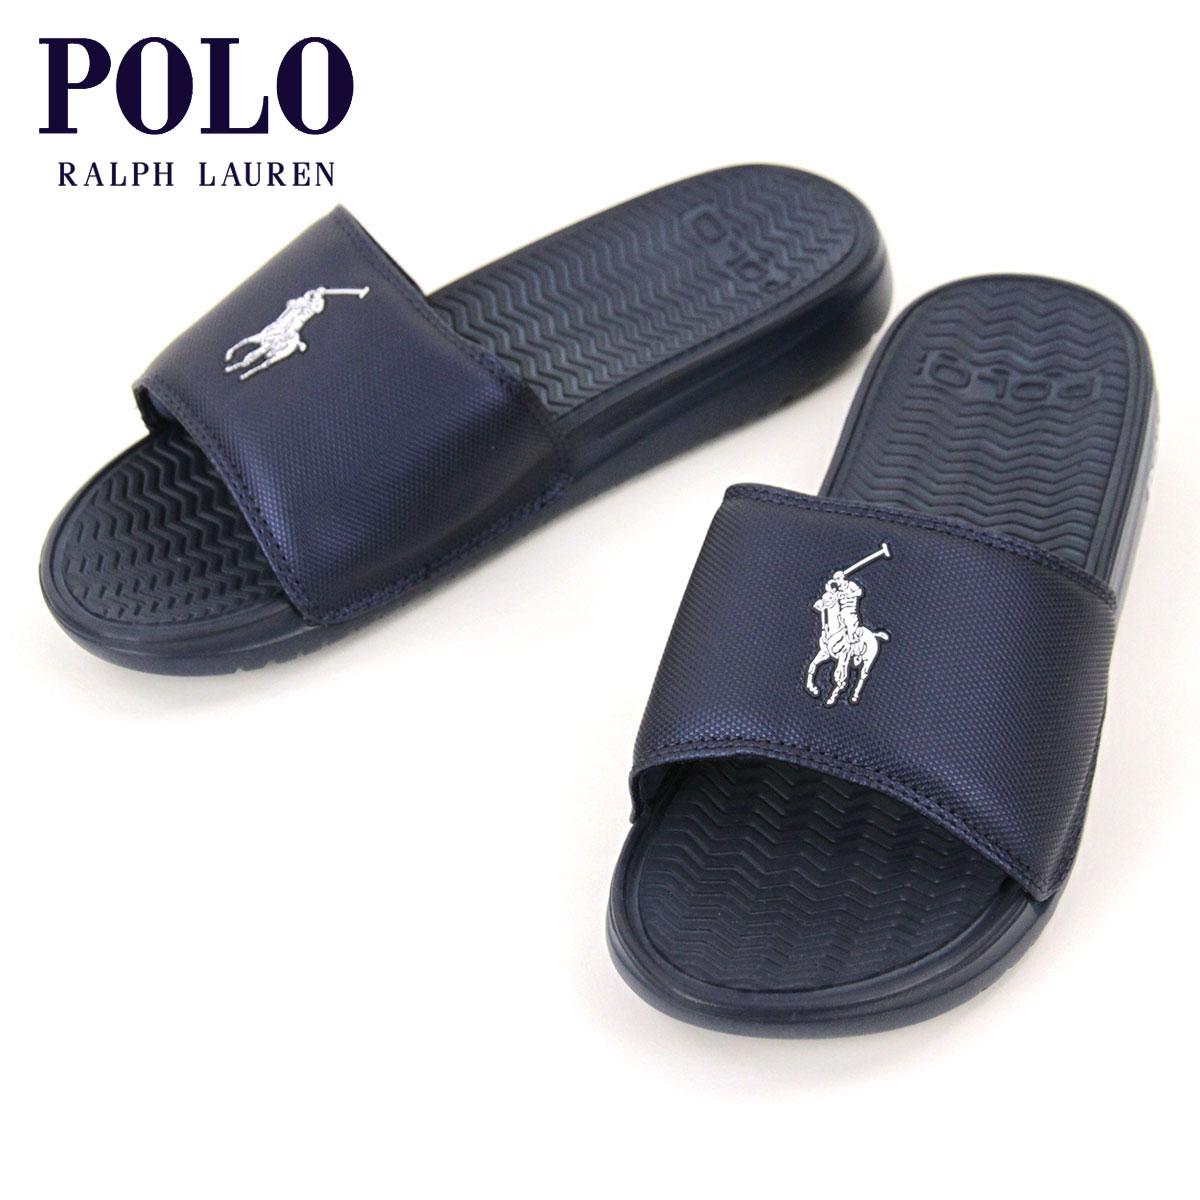 polo slippers - 64% OFF - tajpalace.net